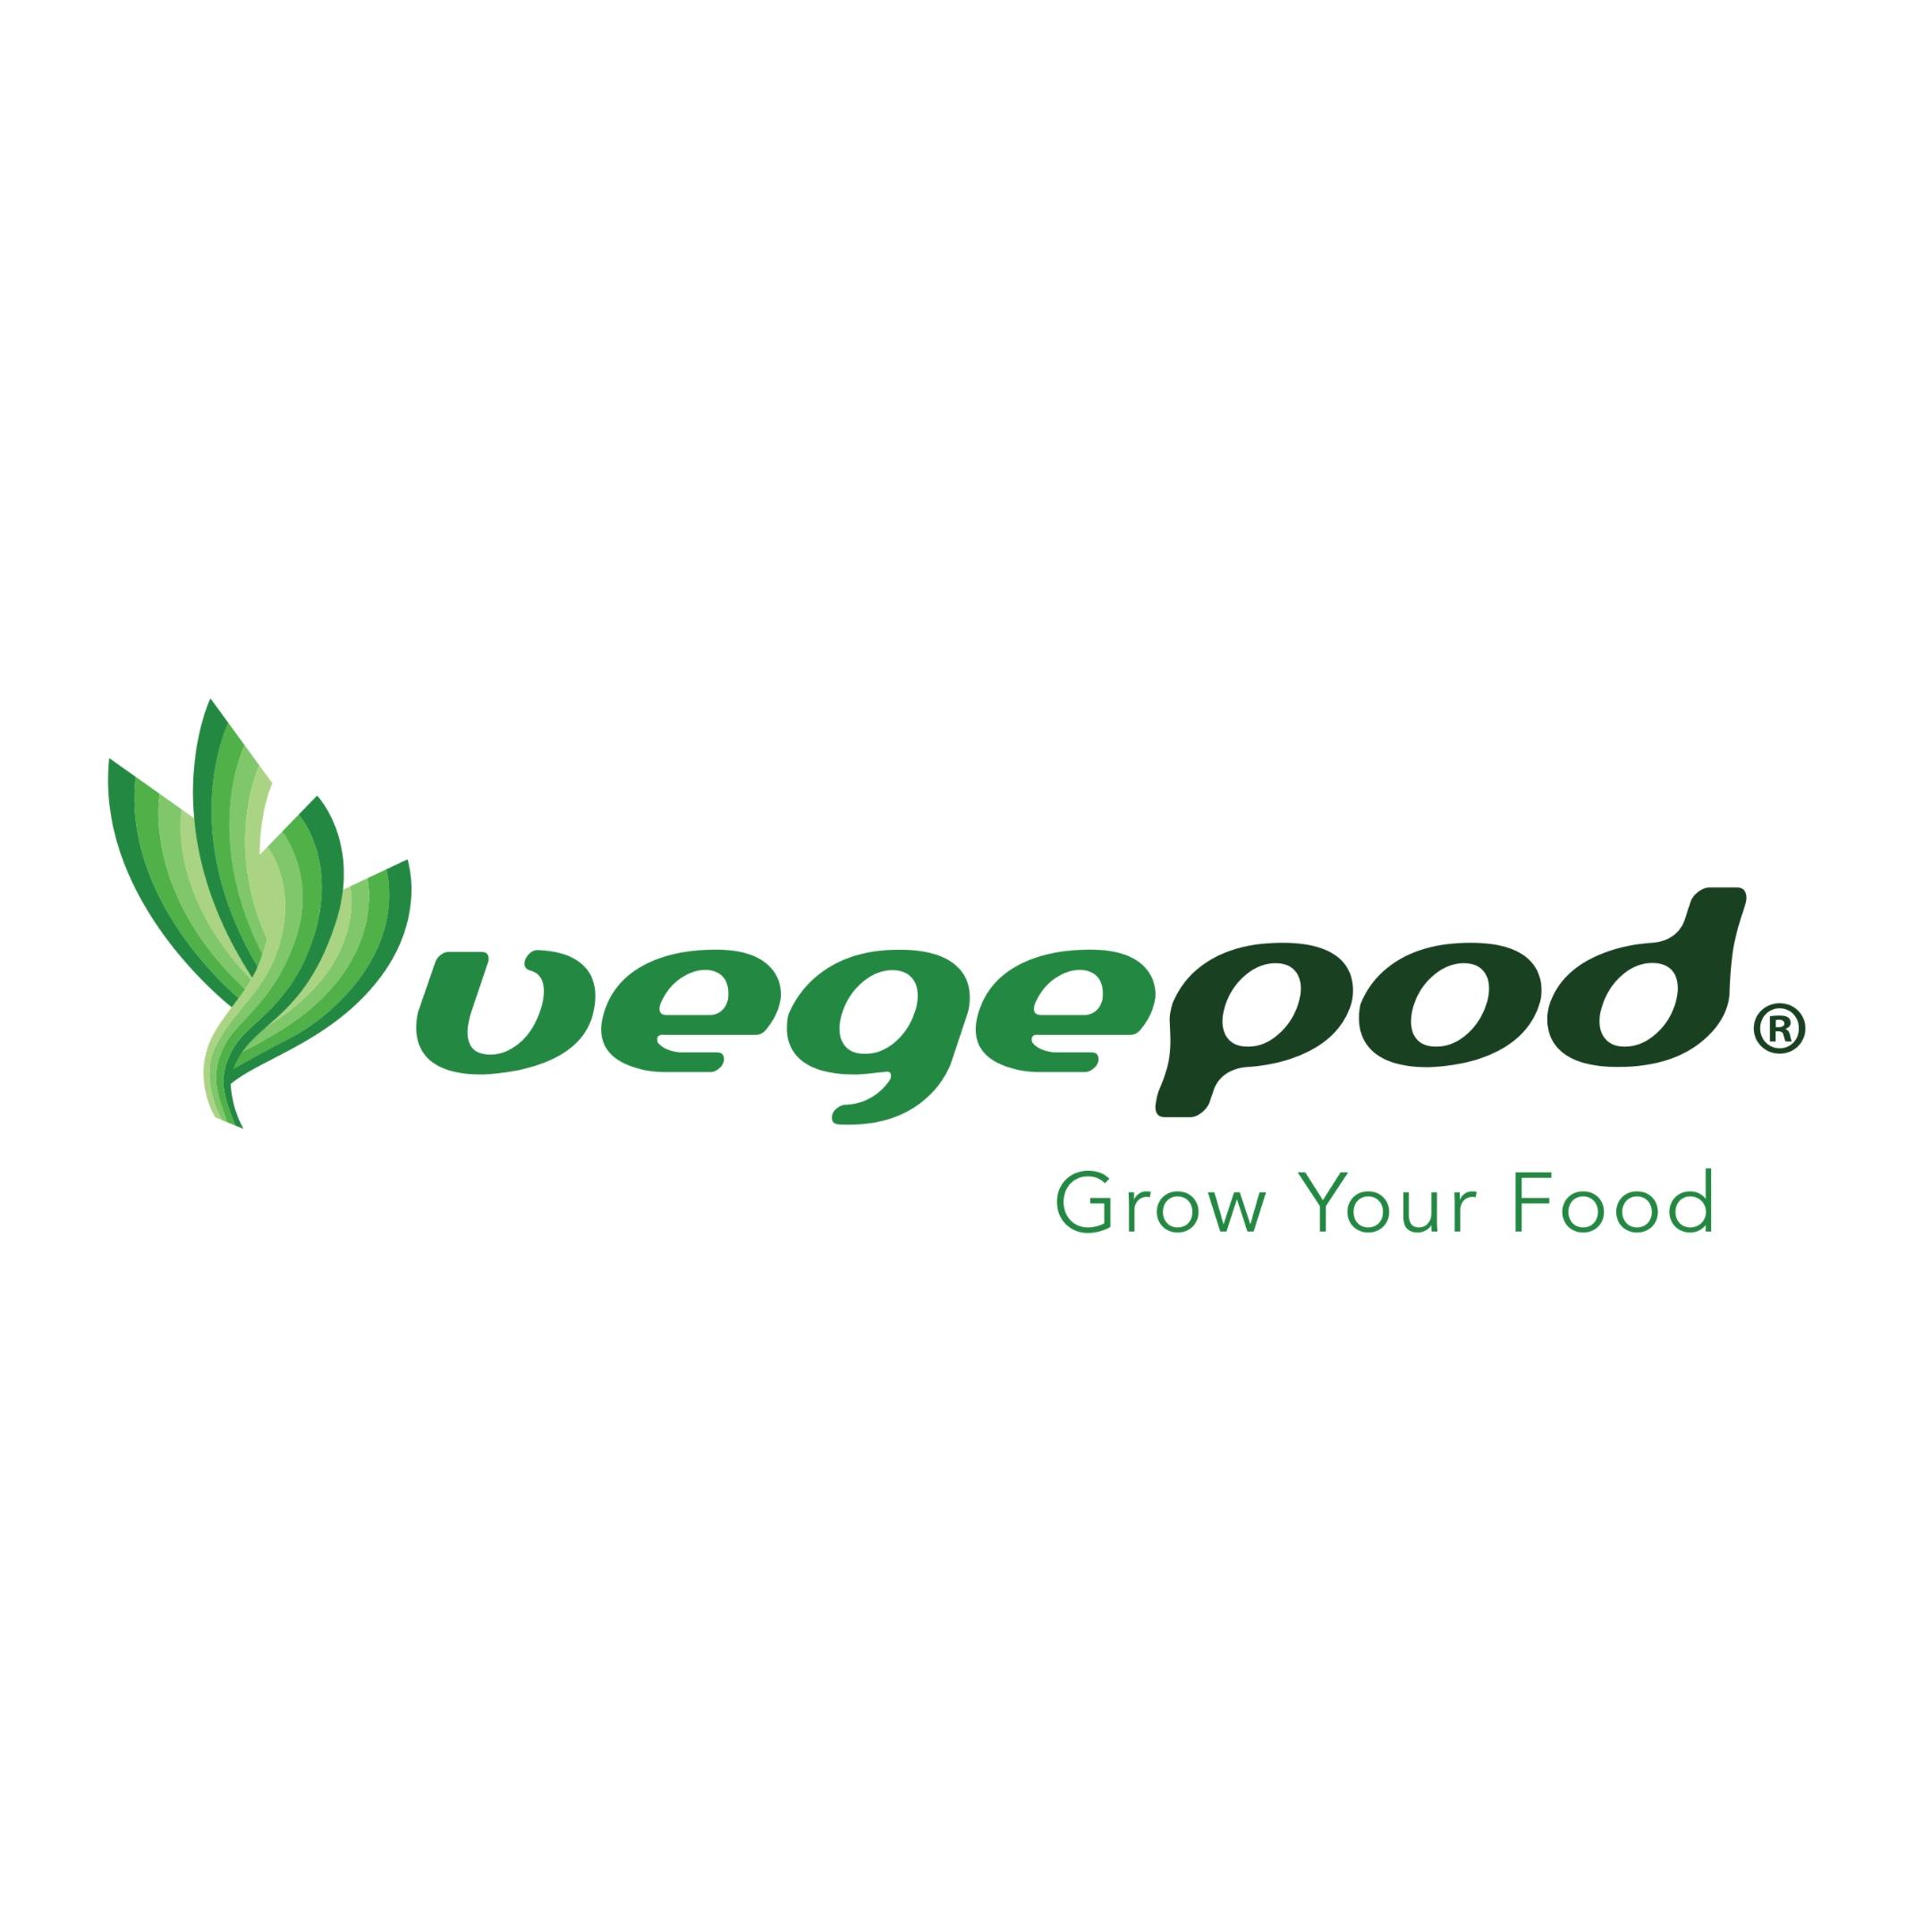 Vegepod - NGA Future Innovation Inc.